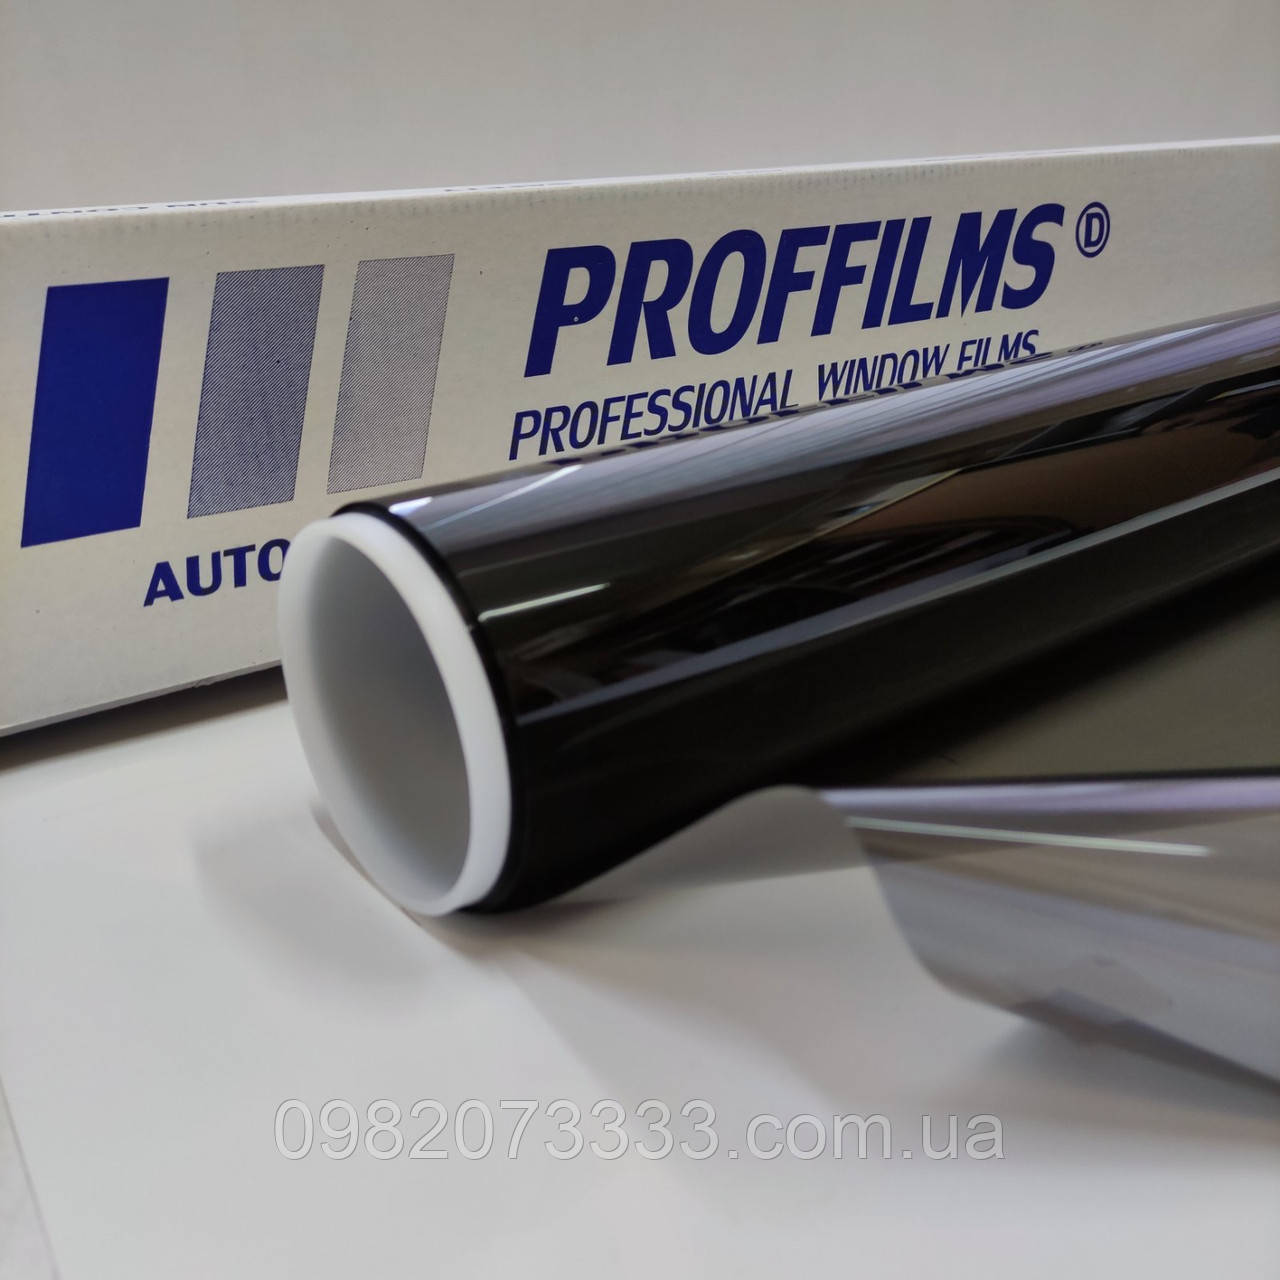 Автомобильная пленка IR Black 35% нано керамическая для авто. Плівка тонувальна ширина 1,524 (цена за кв.м)